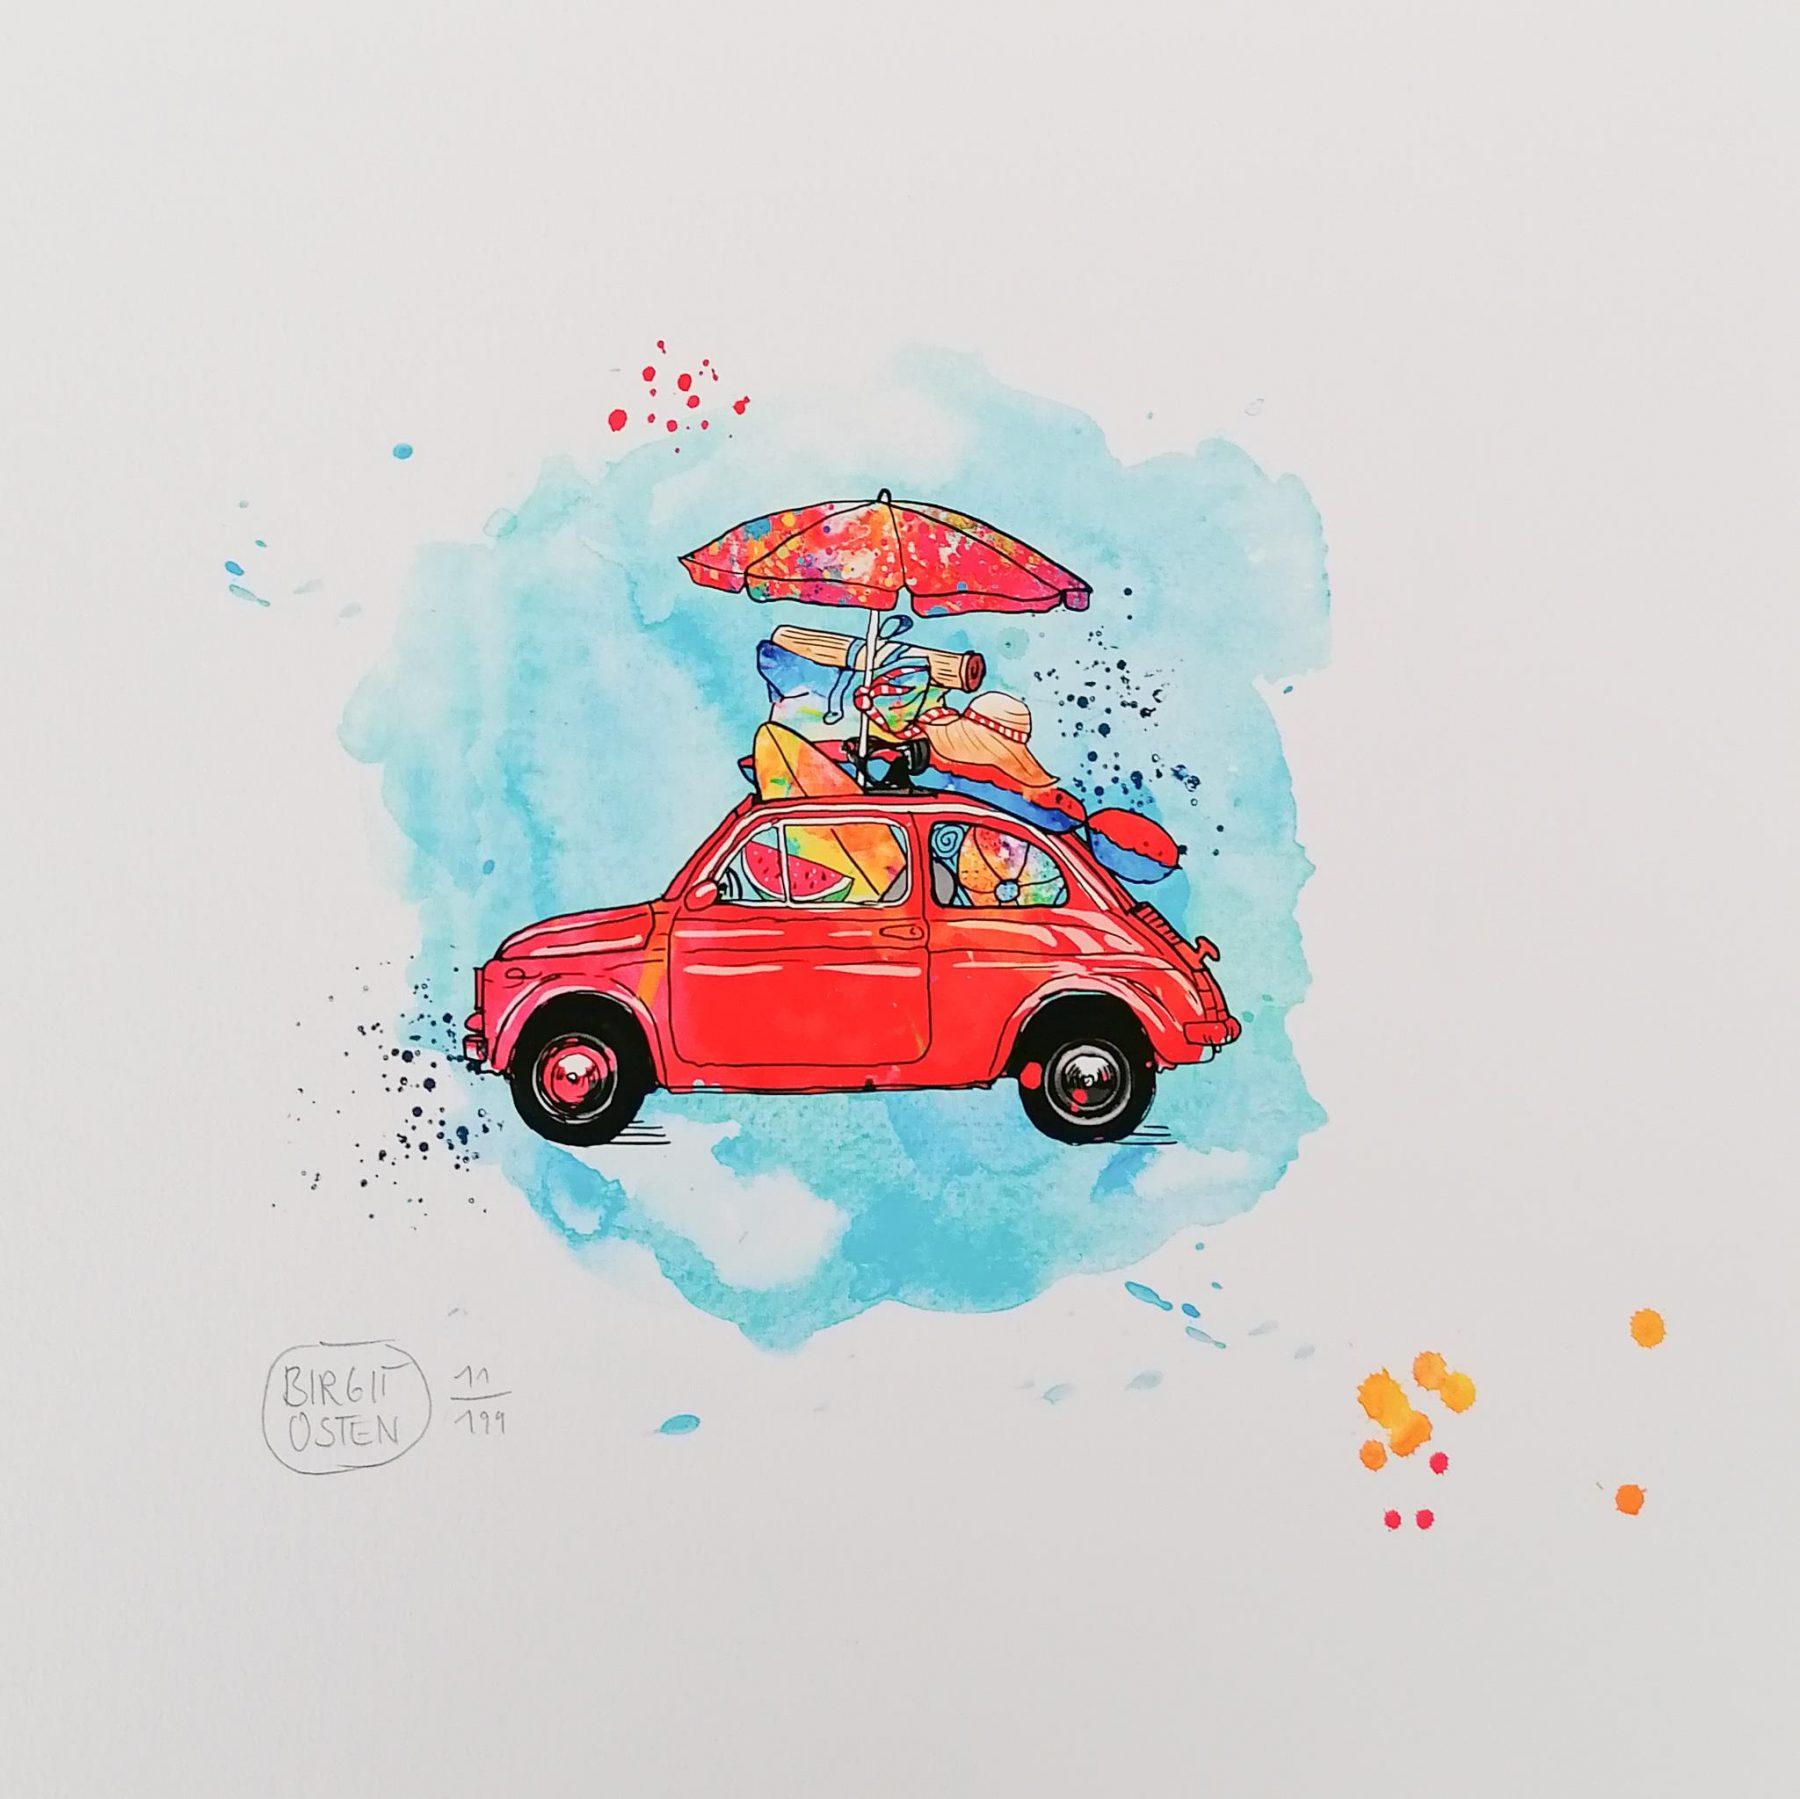 Happy Cars: Fiat 500 - Osten, Birgit - k-BO98